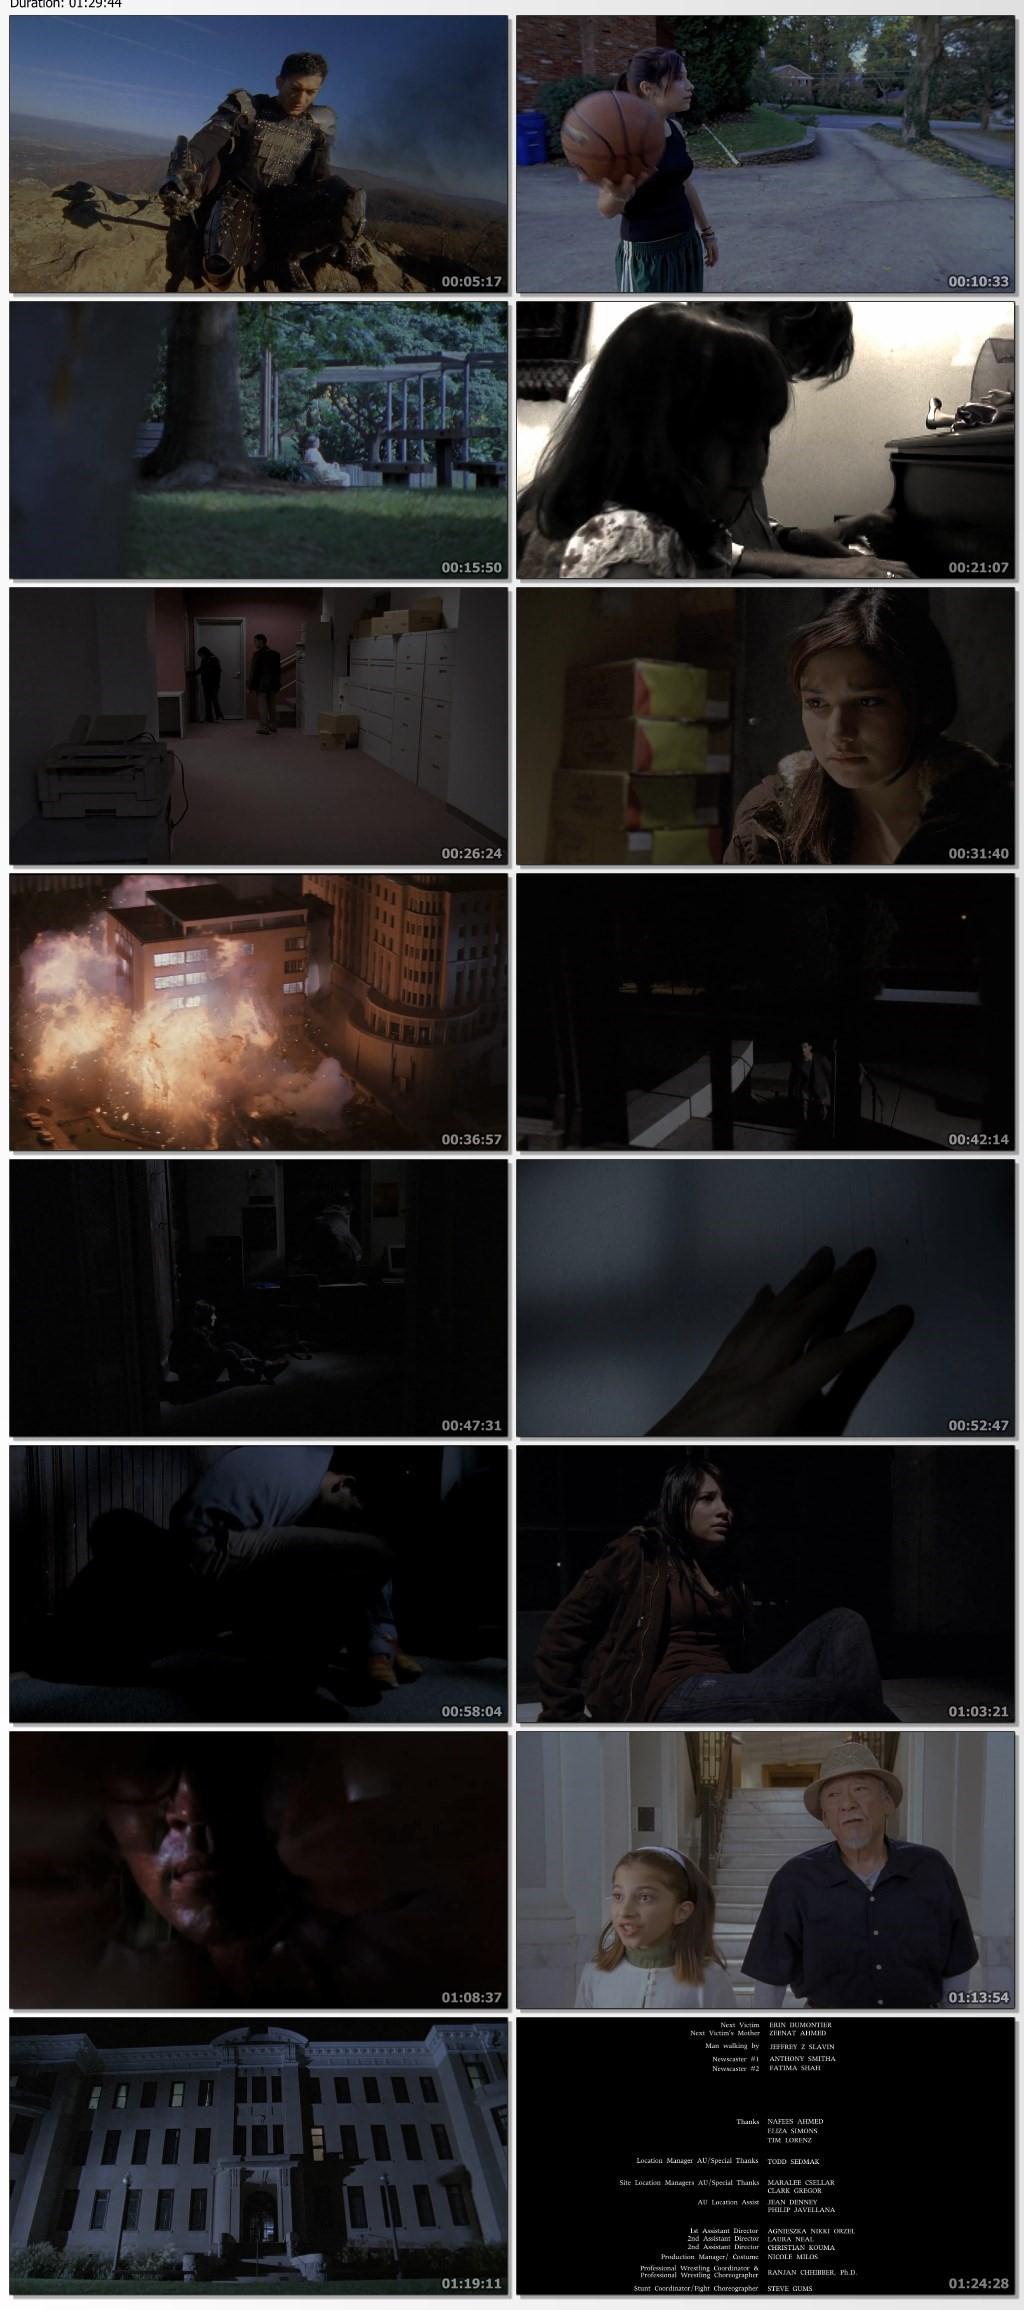 Royal-Kill-2009-www-9kmovies-work-Hindi-ORG-Dual-Audio-720p-Blu-Ray-ESub-1-GB-mkv-thumbsef33dc271920